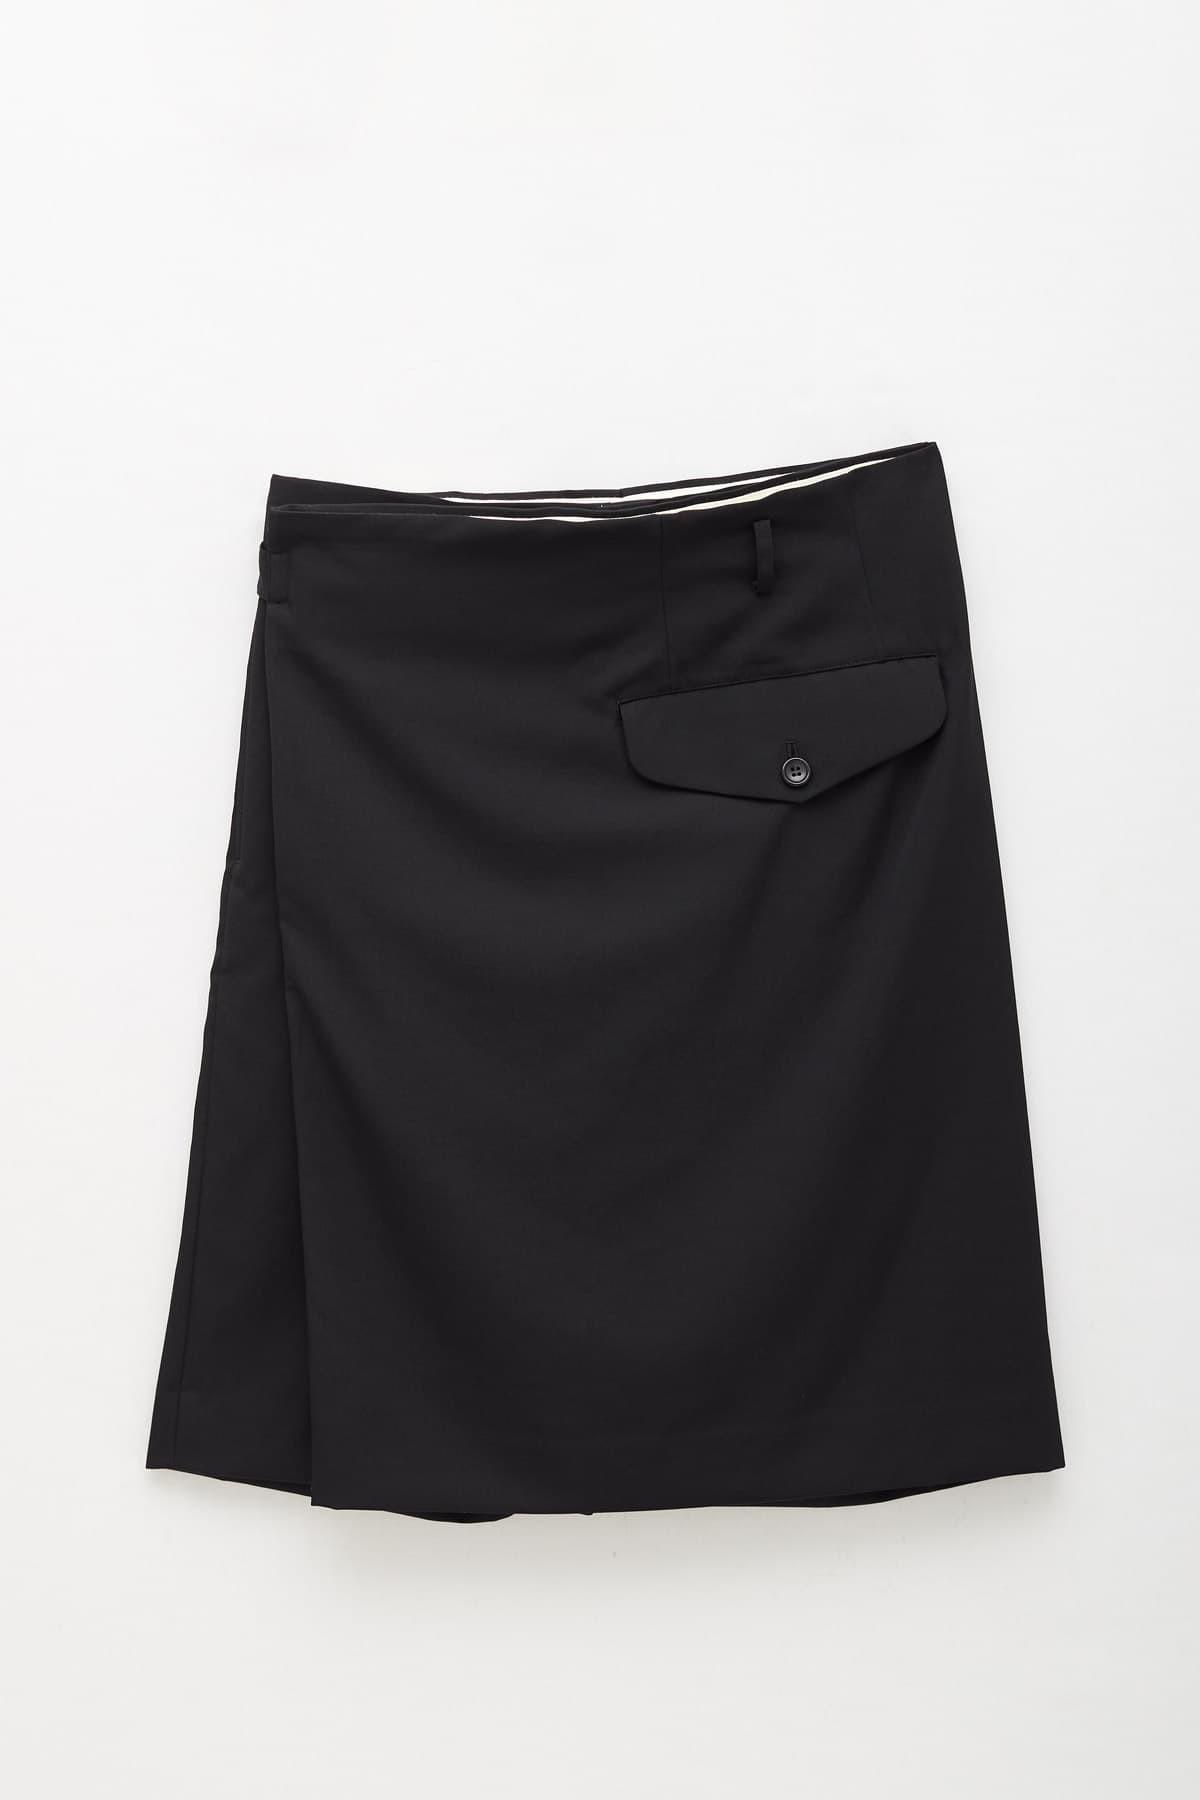 Shop Maison Kitsuné White Flower Fox T-Shirt